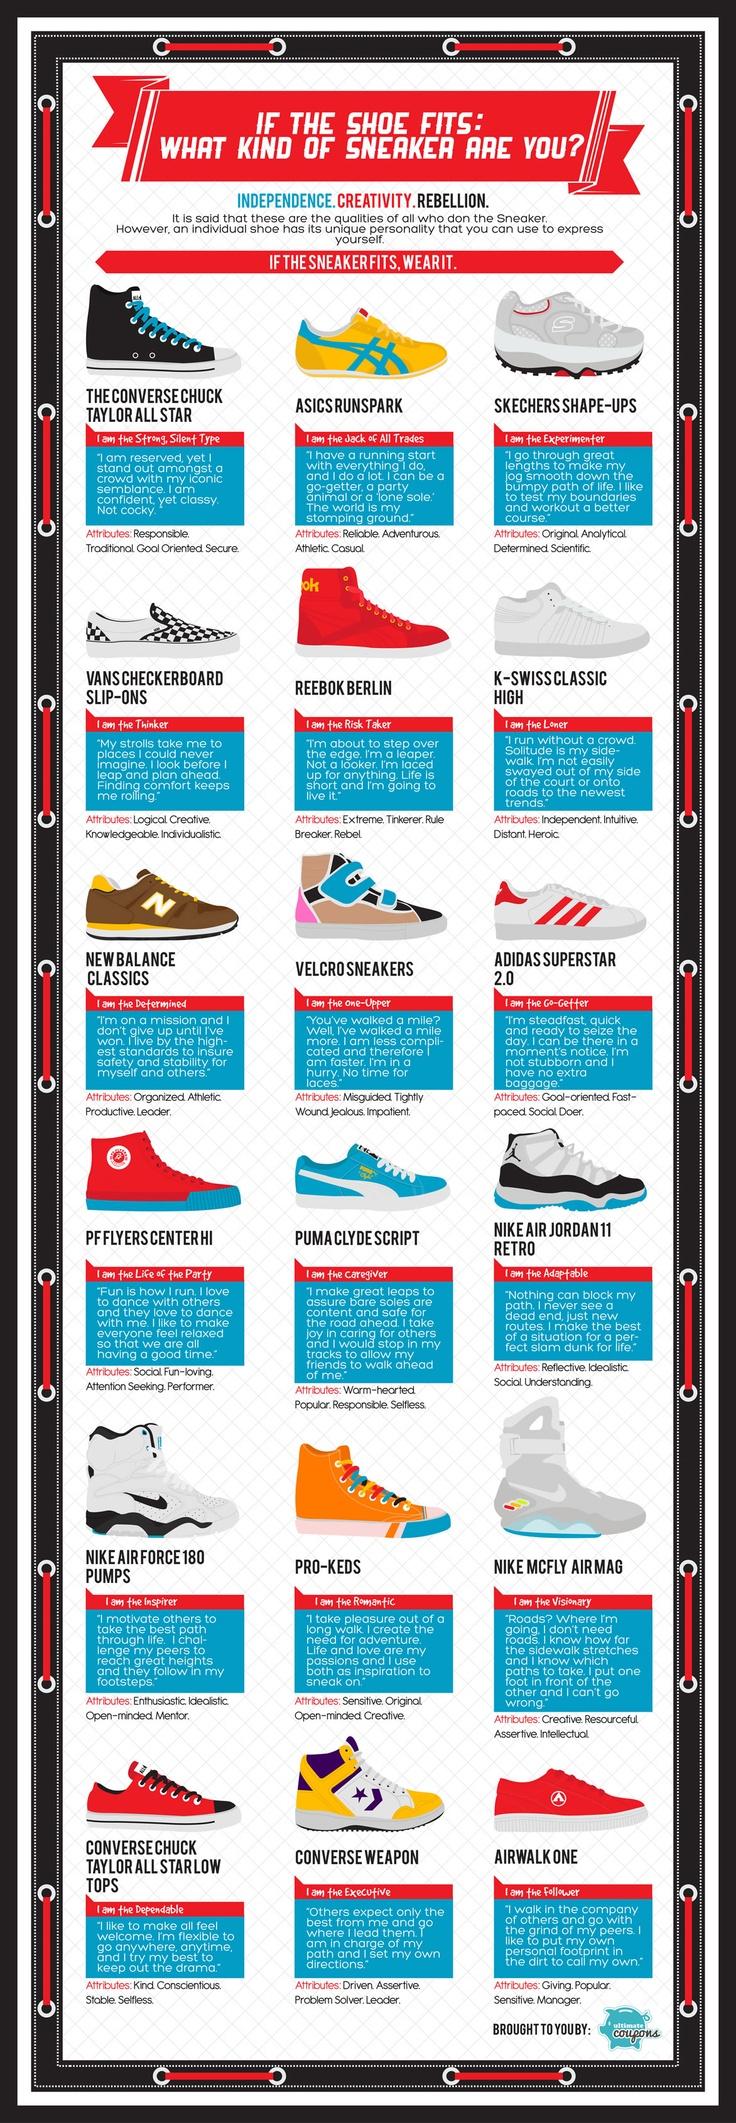 Kind of Sneaker